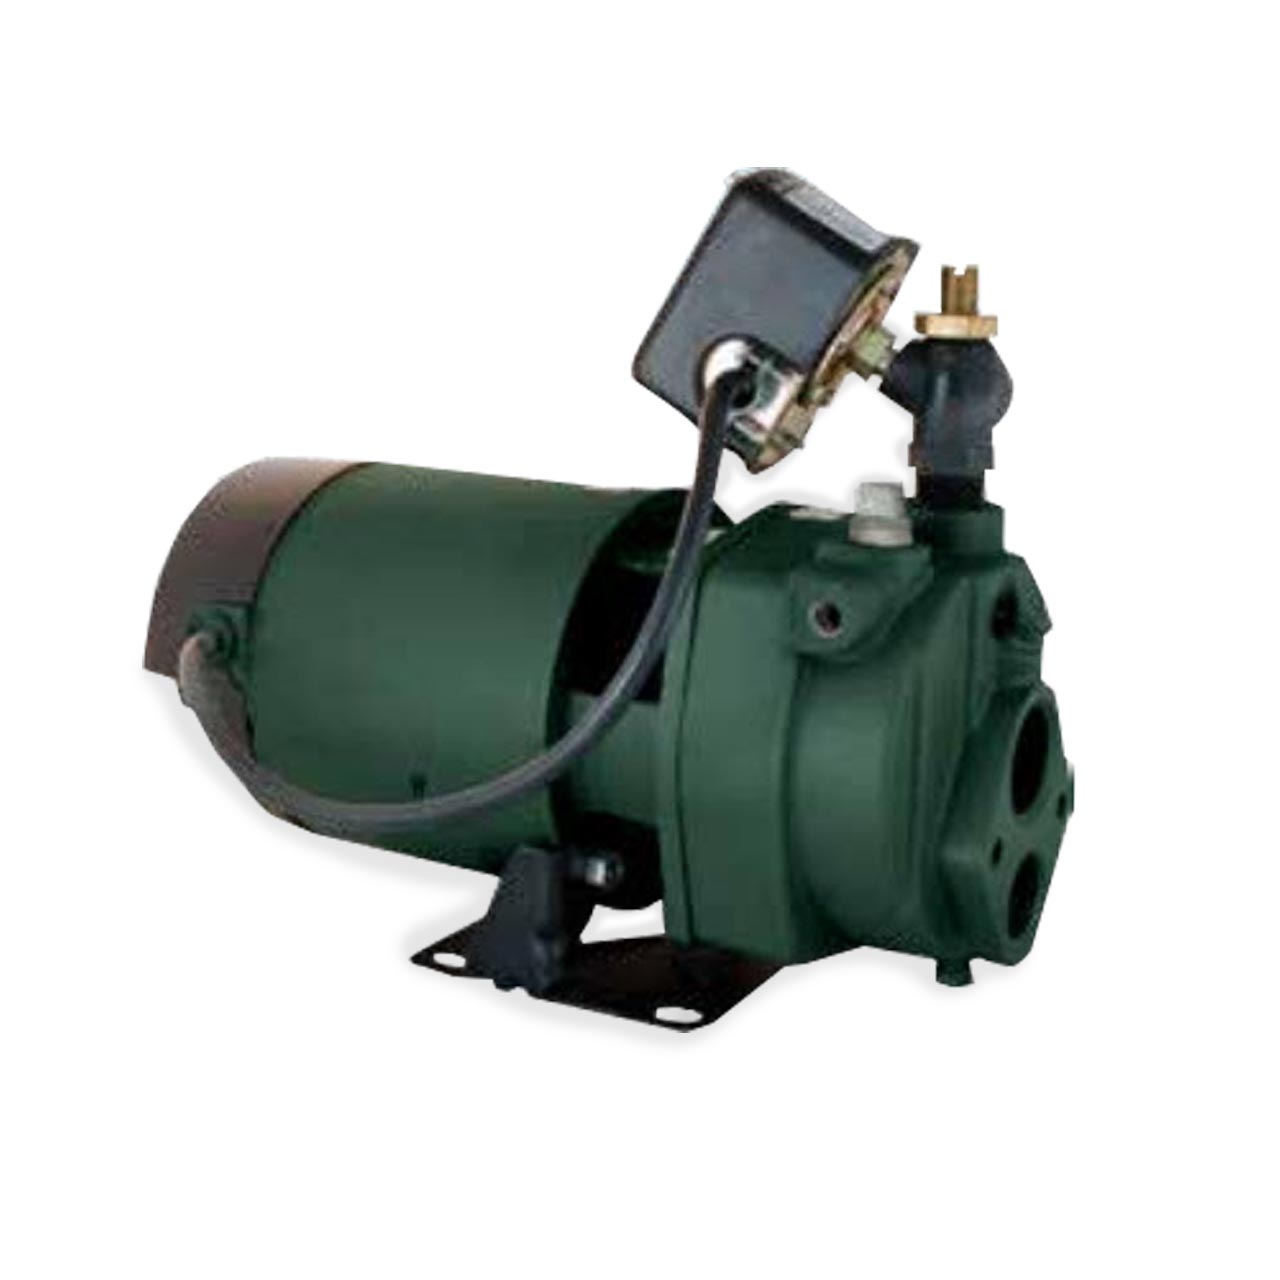 Zoeller zoeller 462 0006 model 462 convertible deep well for How to test well pump motor